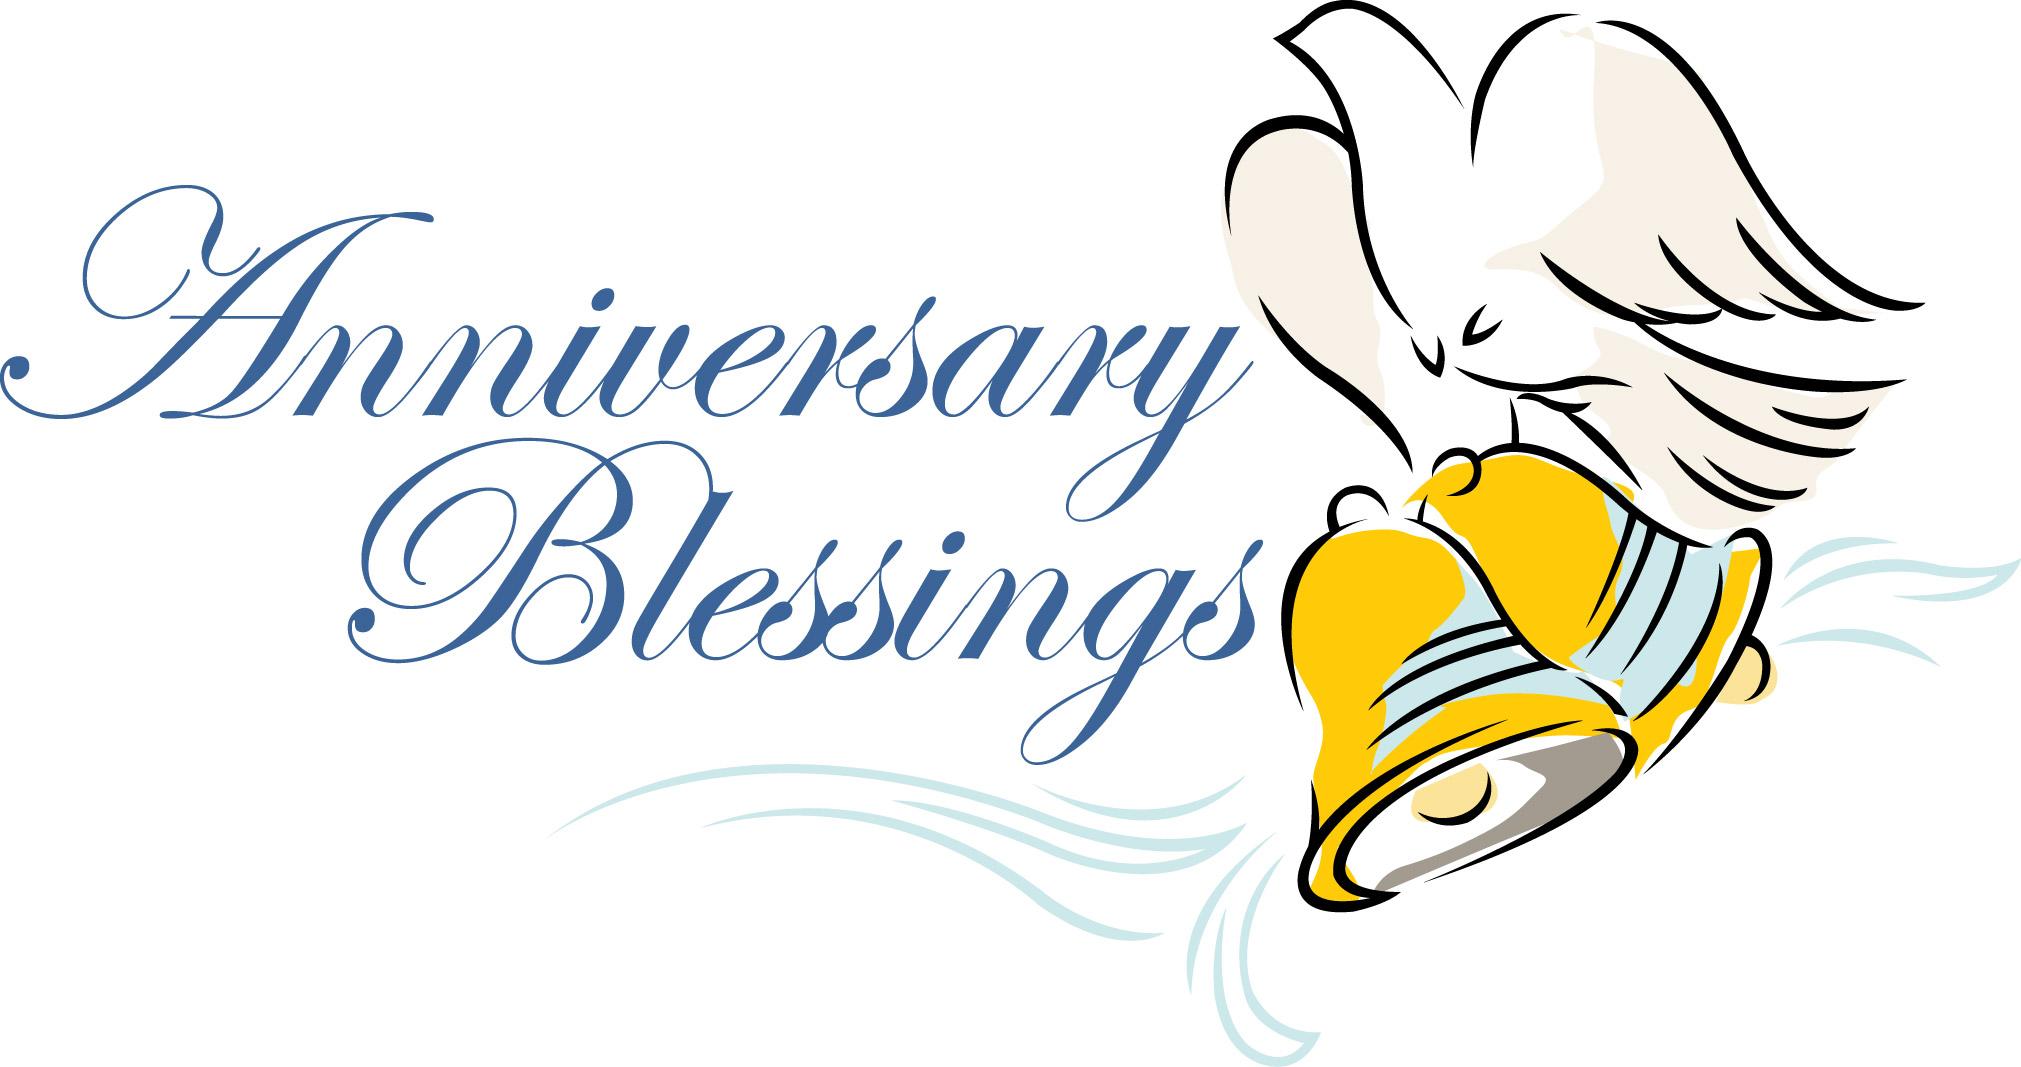 Anniversary clipart april. Free church cliparts download